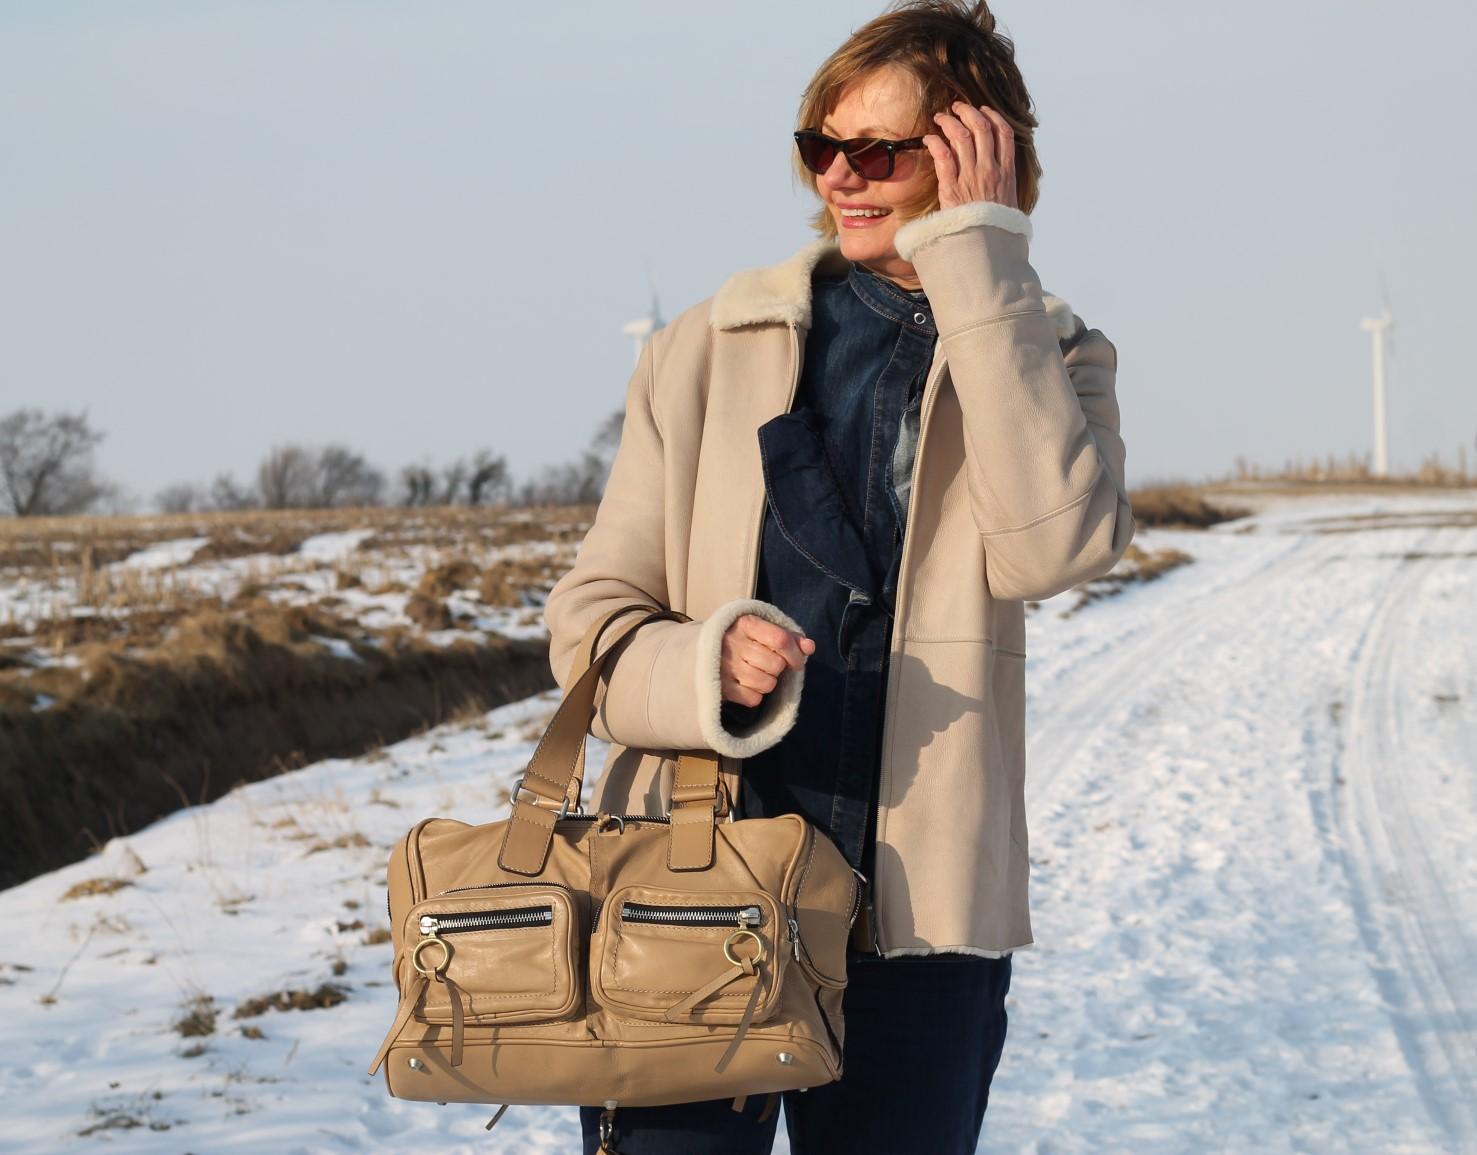 nordfriesland outfit im schnee lammfell